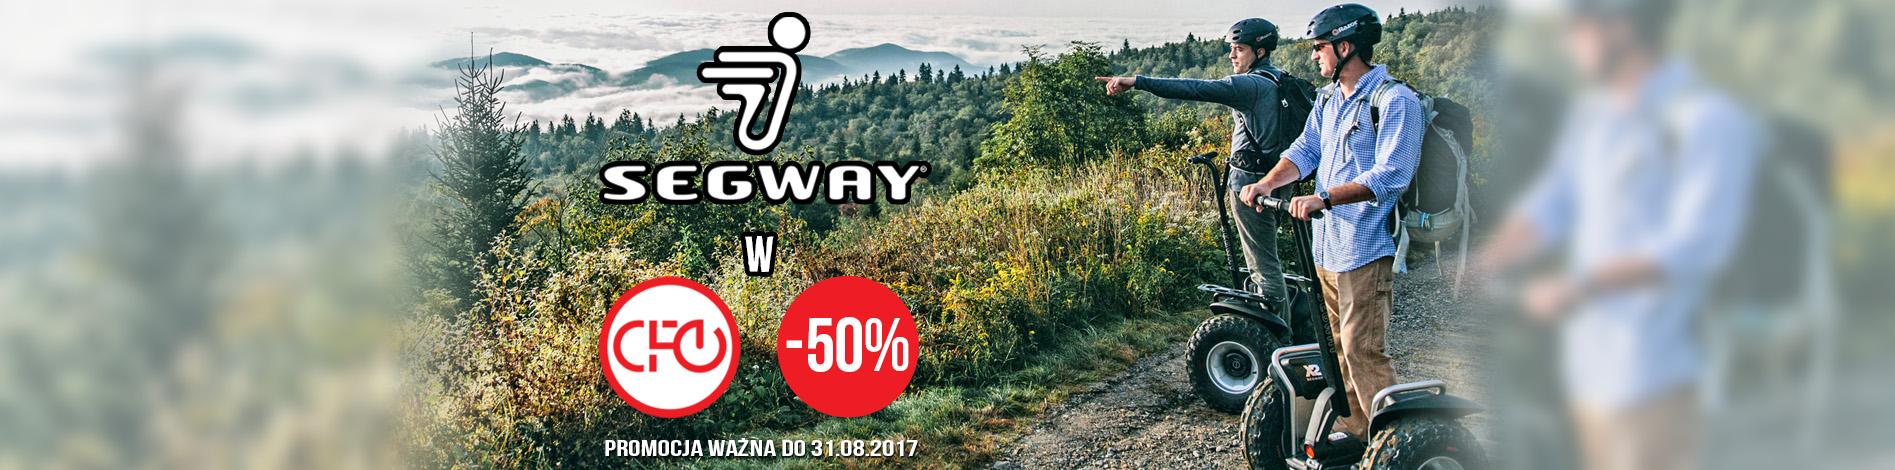 segrway 50% slider copy